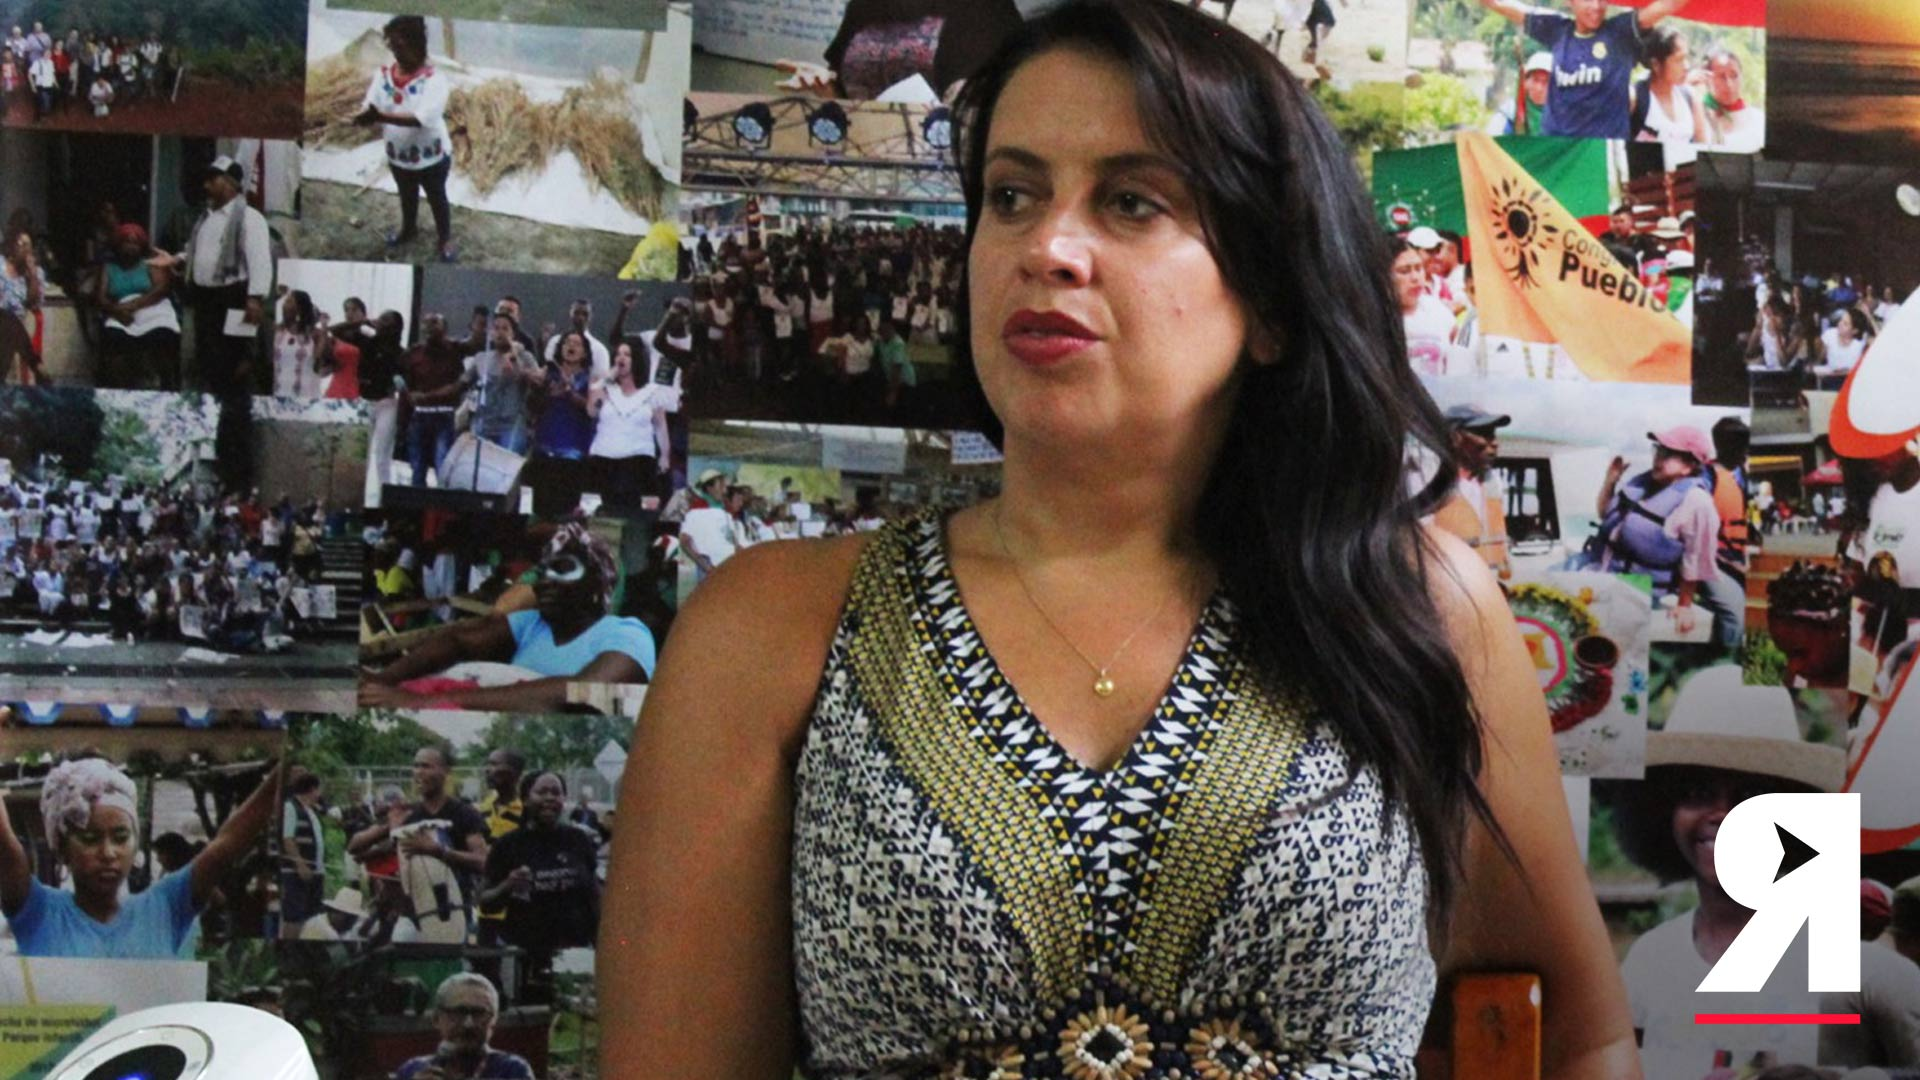 'Las comunidades afro no sienten que haya posconflicto': Natasha Lycia Ora Bannan